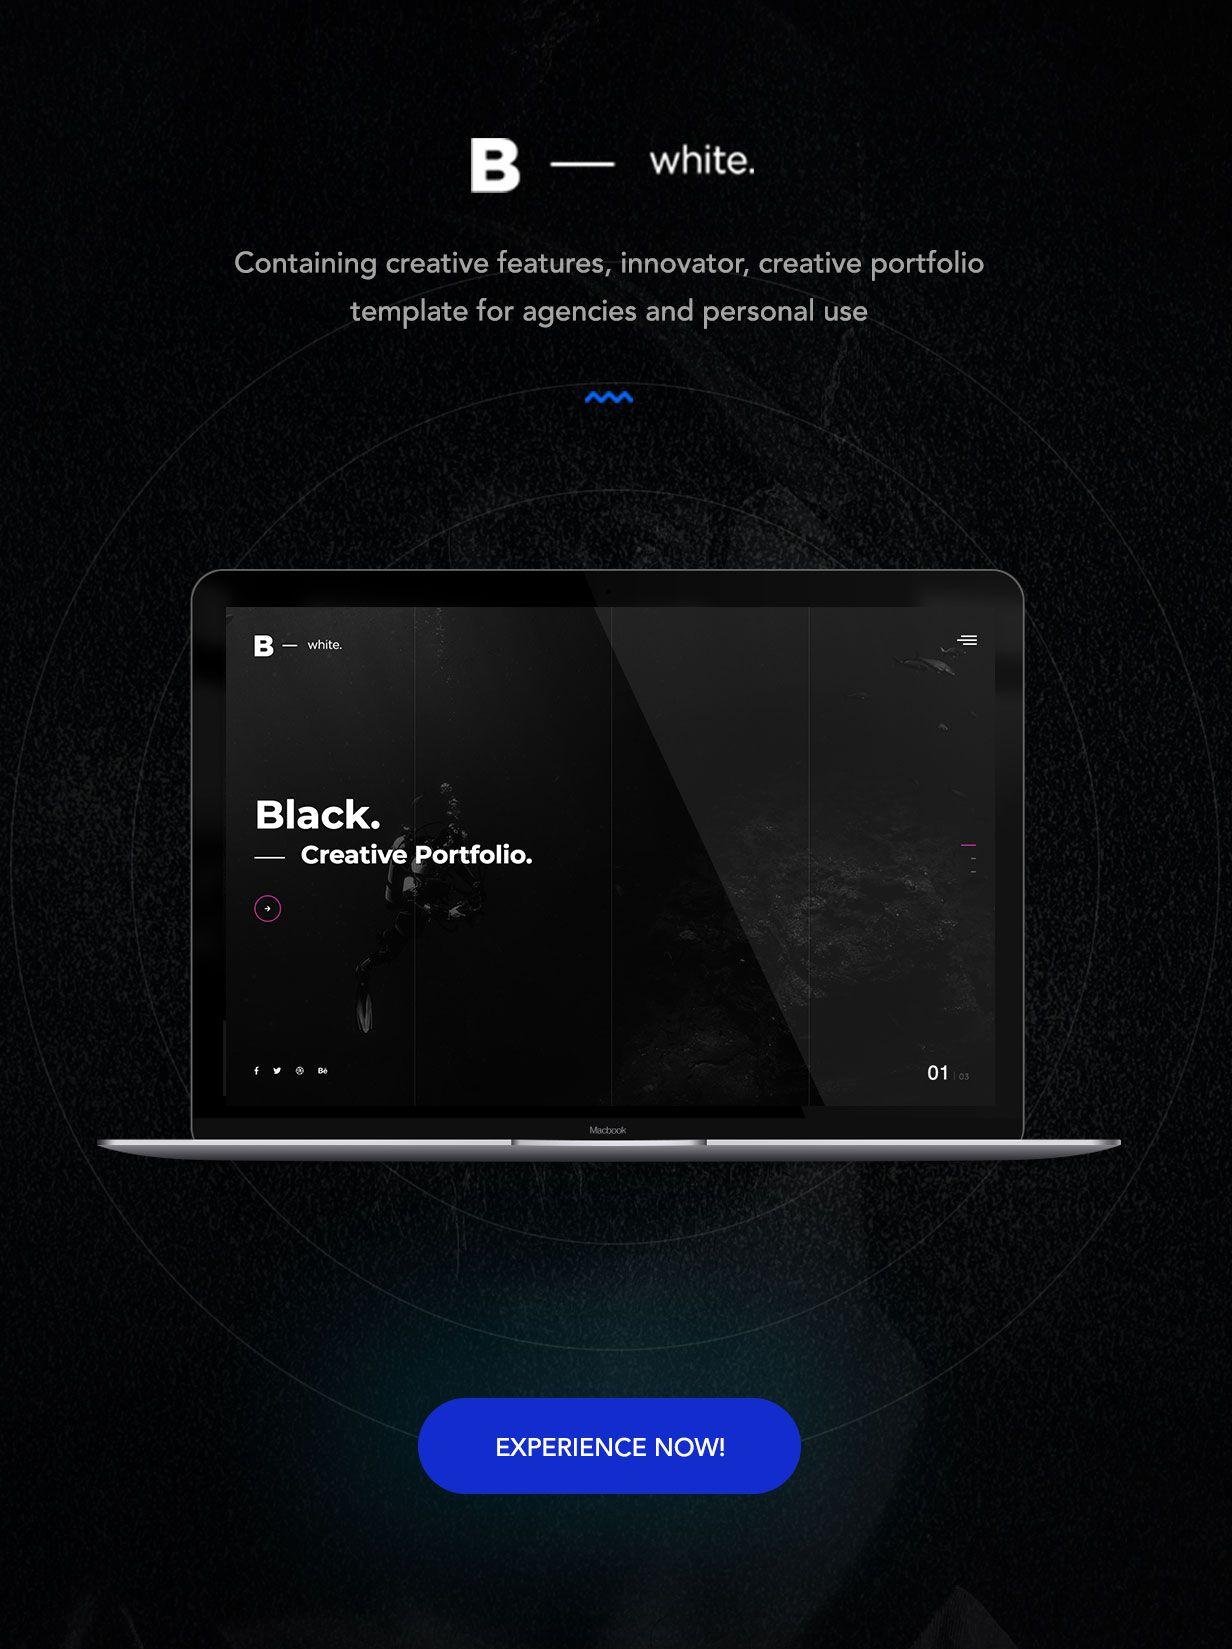 B  White - Creative Portfolio Template by soonlabs